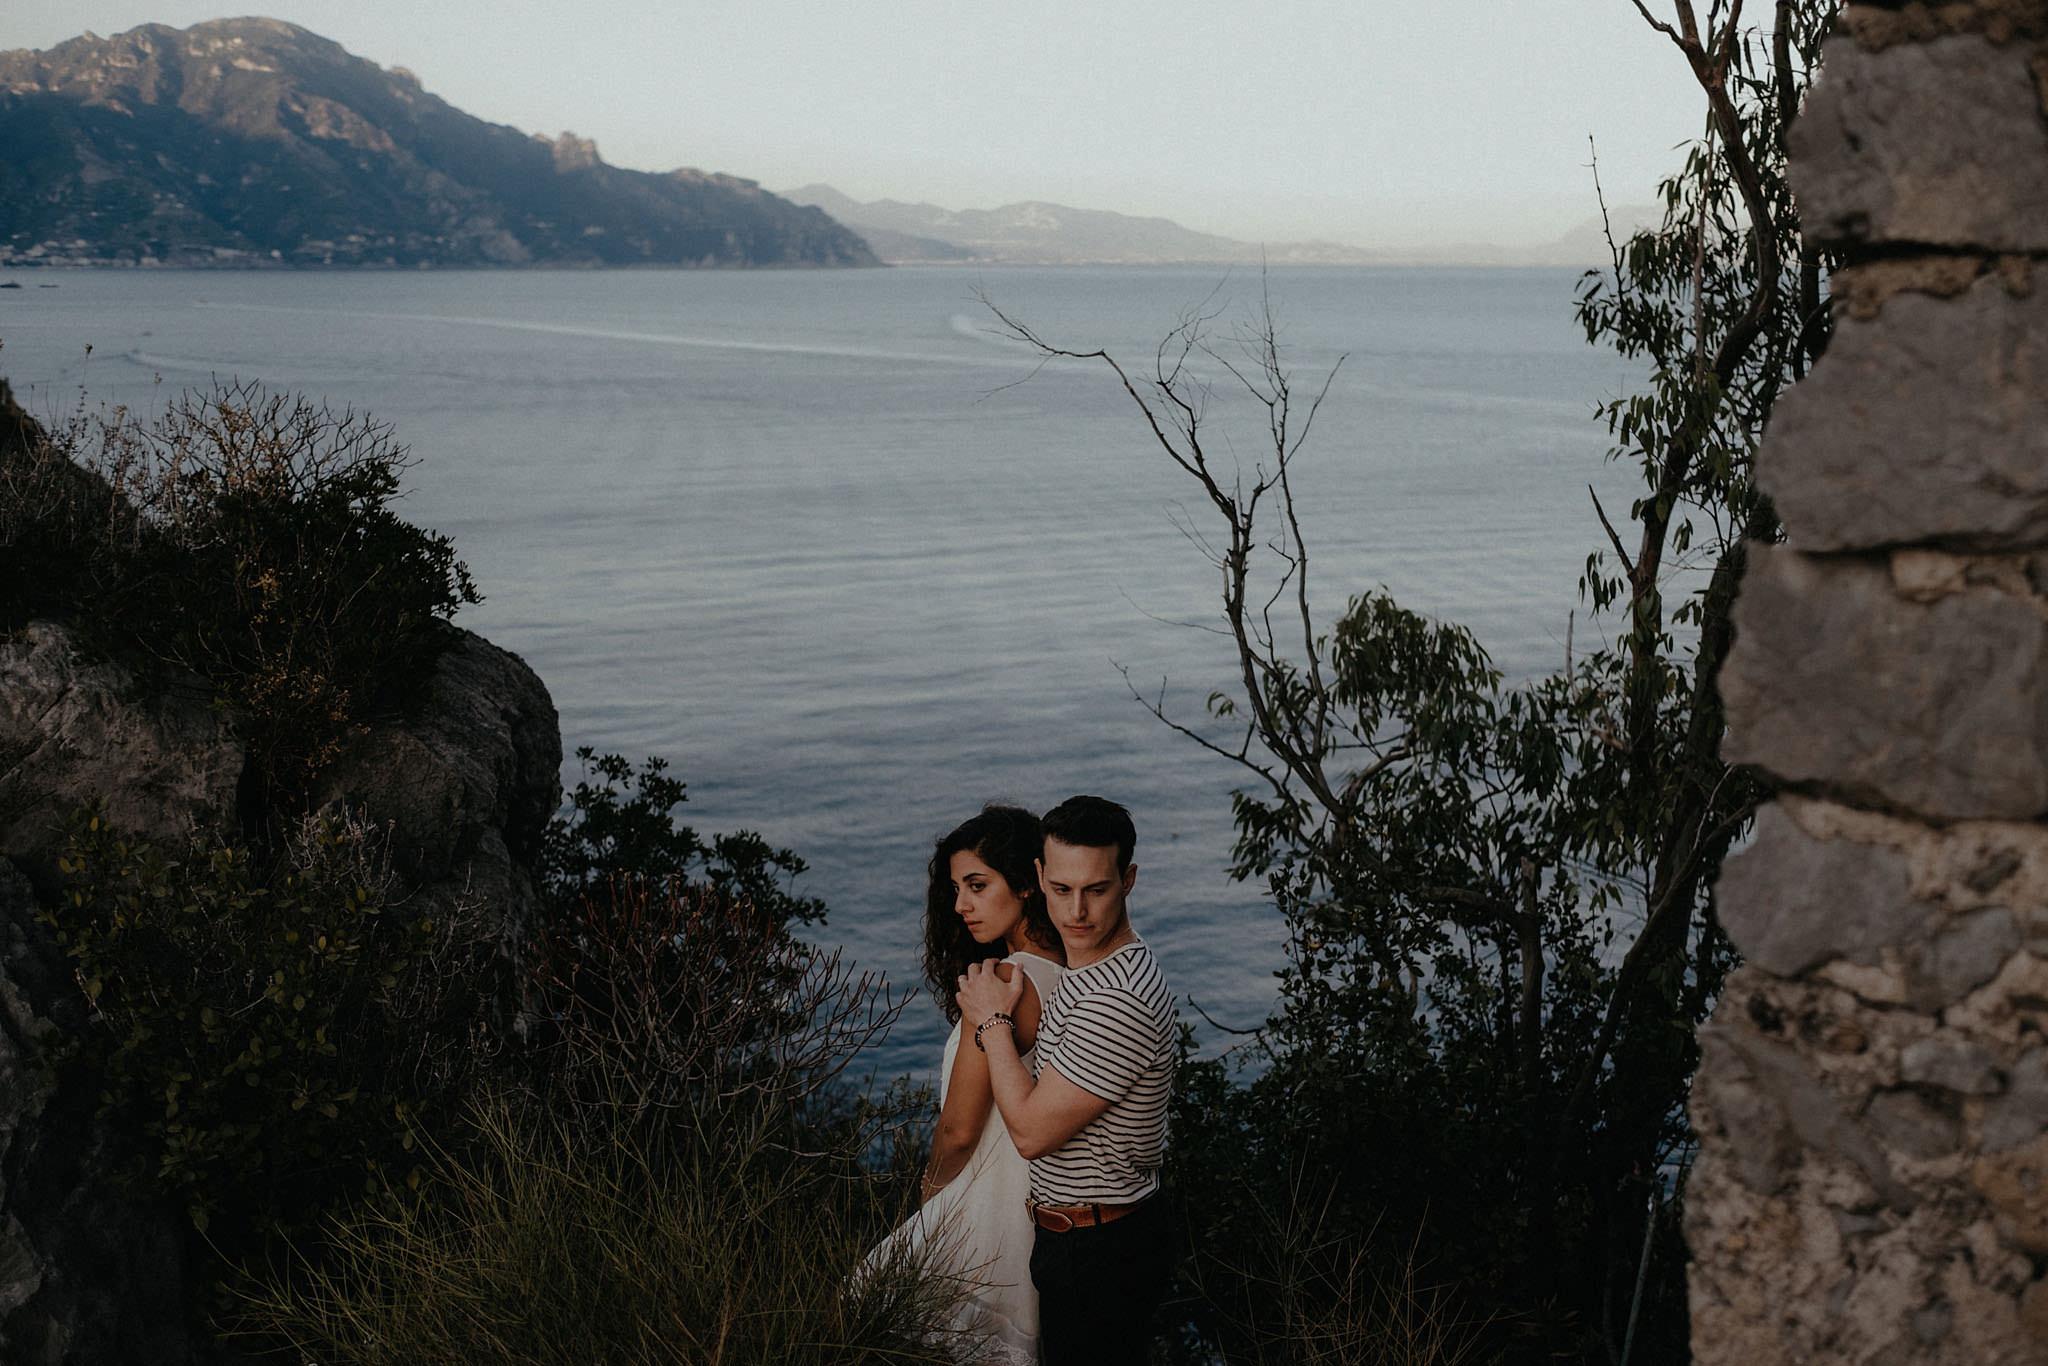 Max-Steph-Italy-Wedding-897.jpg